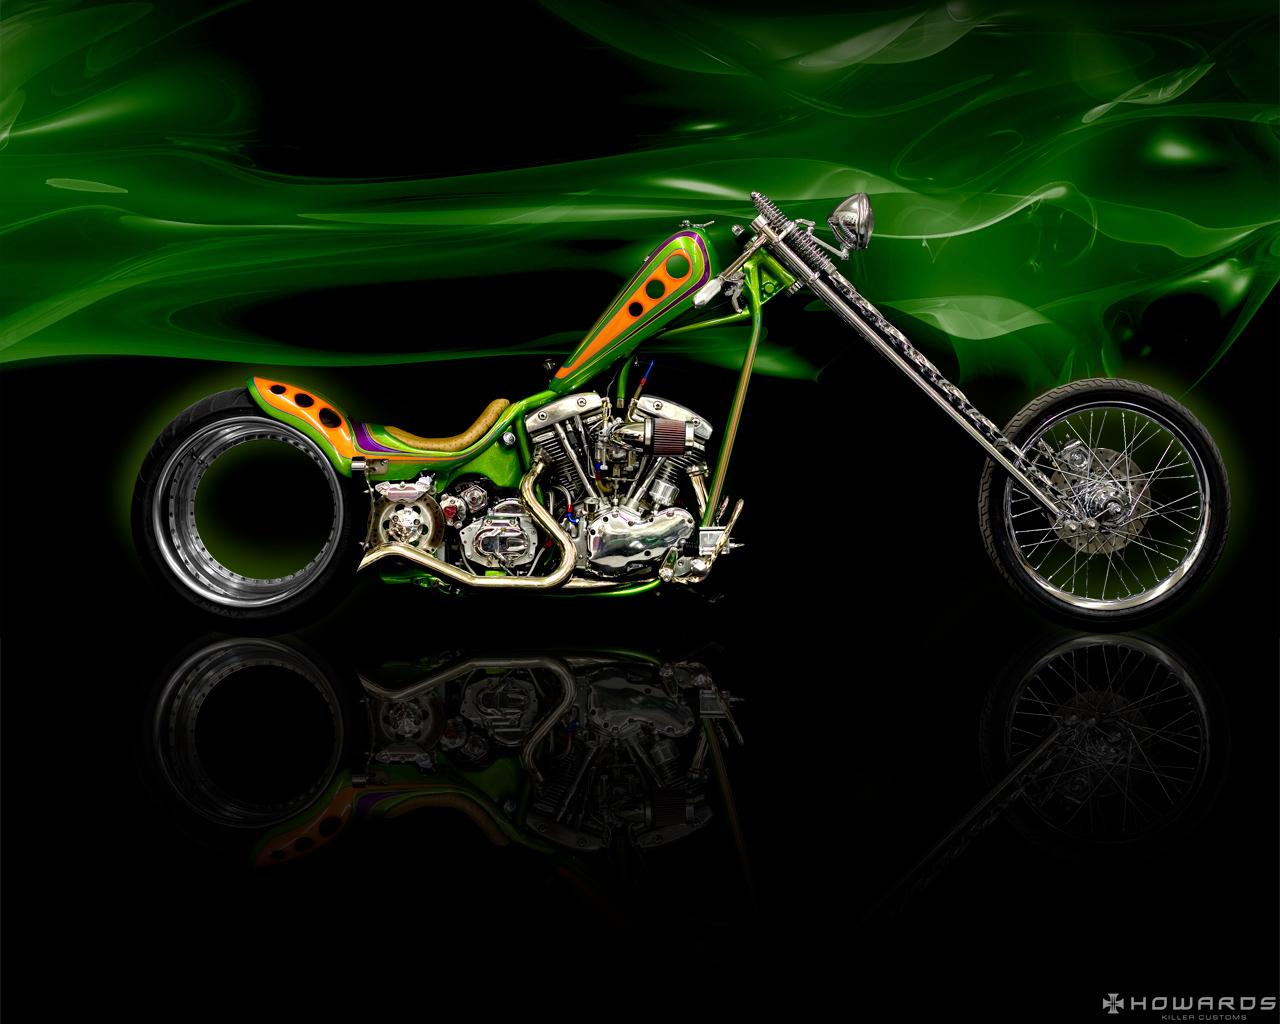 harley davidson windows theme harley davidson motorcycle wallpapers 1280x1024